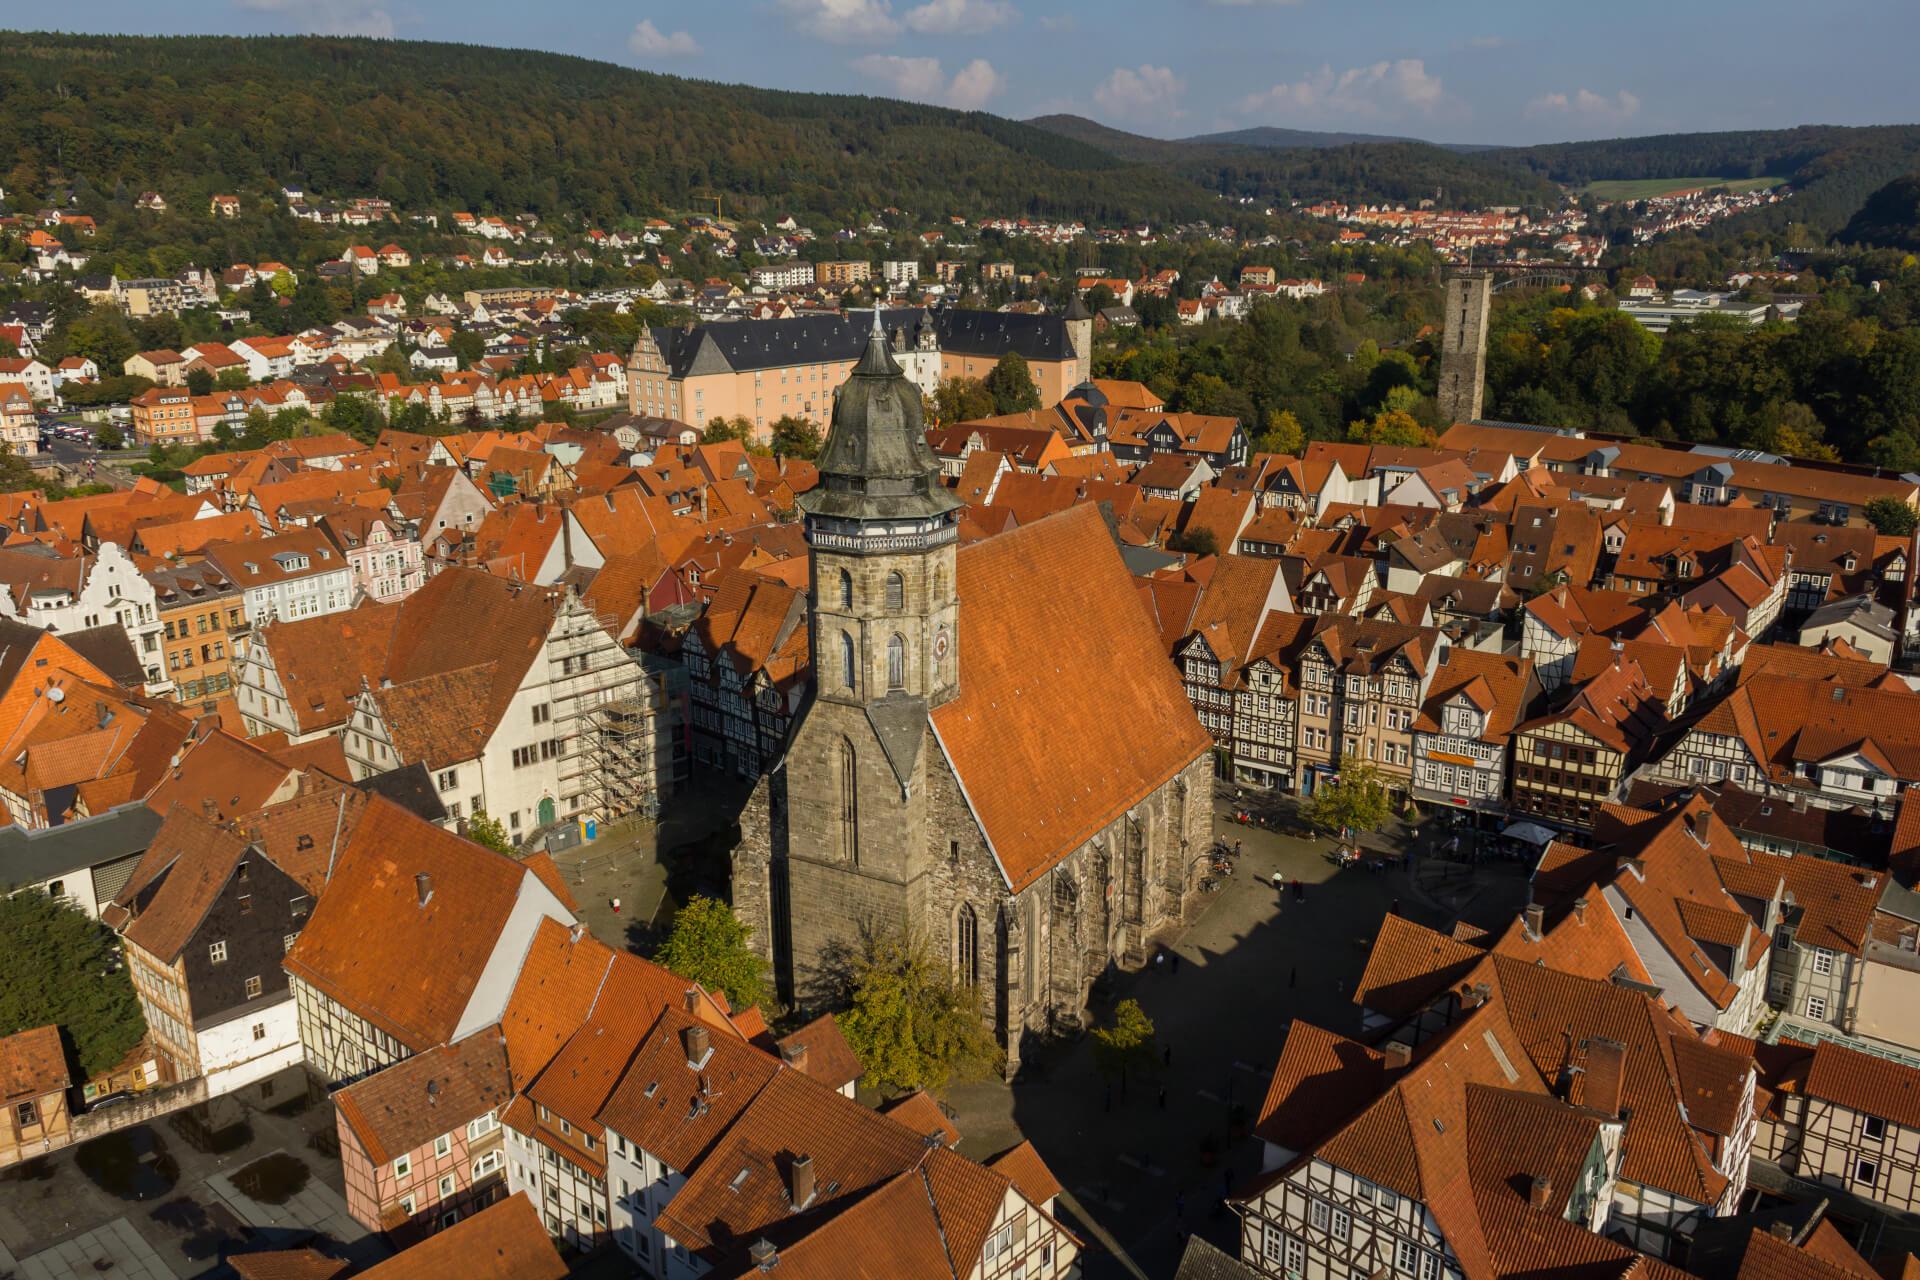 Luftbild St. Blasius Kirche